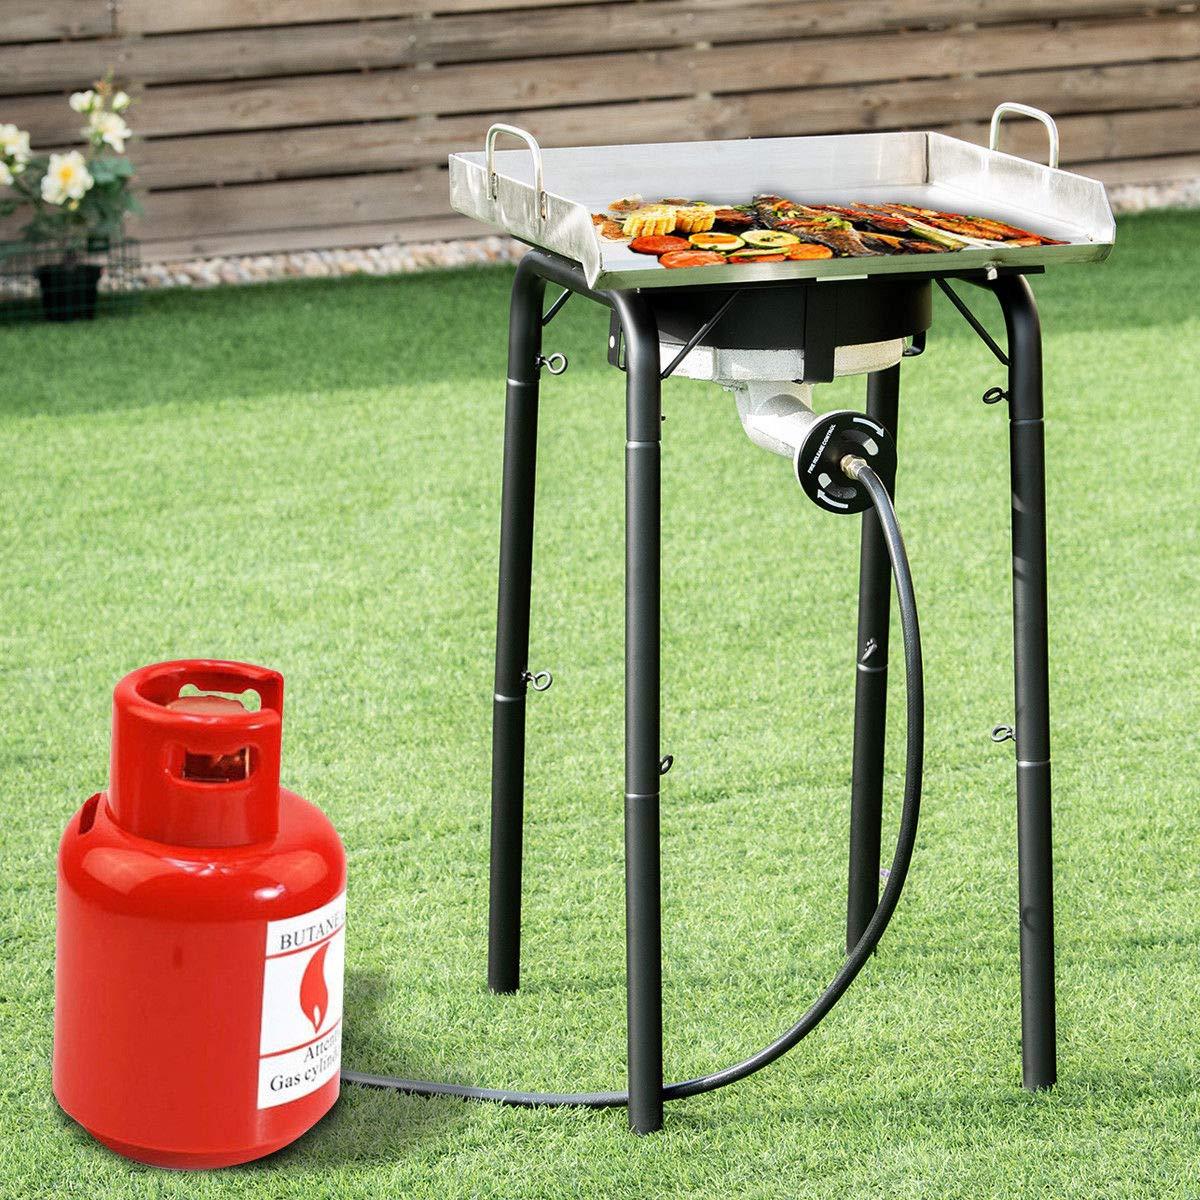 Giantex Portable Propane 200,000-BTU Single Burner Outdoor Stove Cooker Standing Camping Cooking Stove w CSA Listed High Pressure Regulator, Hose, Adjustable Legs